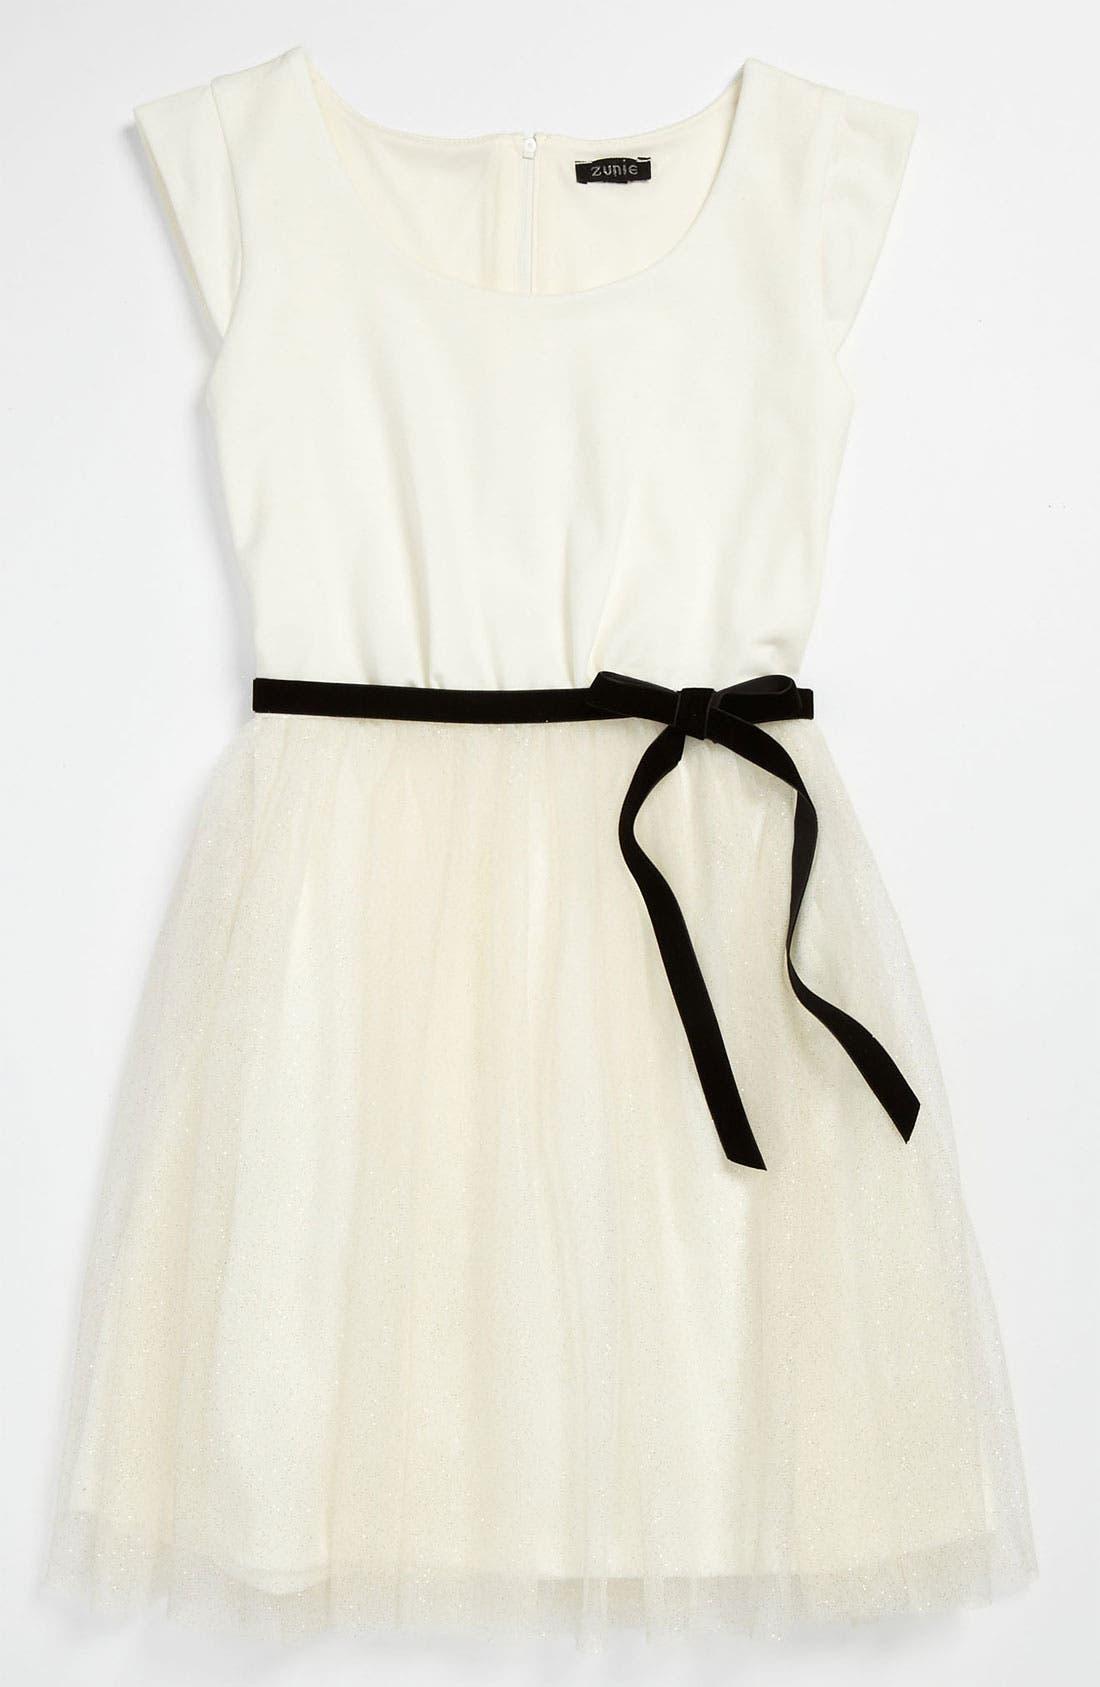 Main Image - Zunie Tulle Dress (Big Girls)